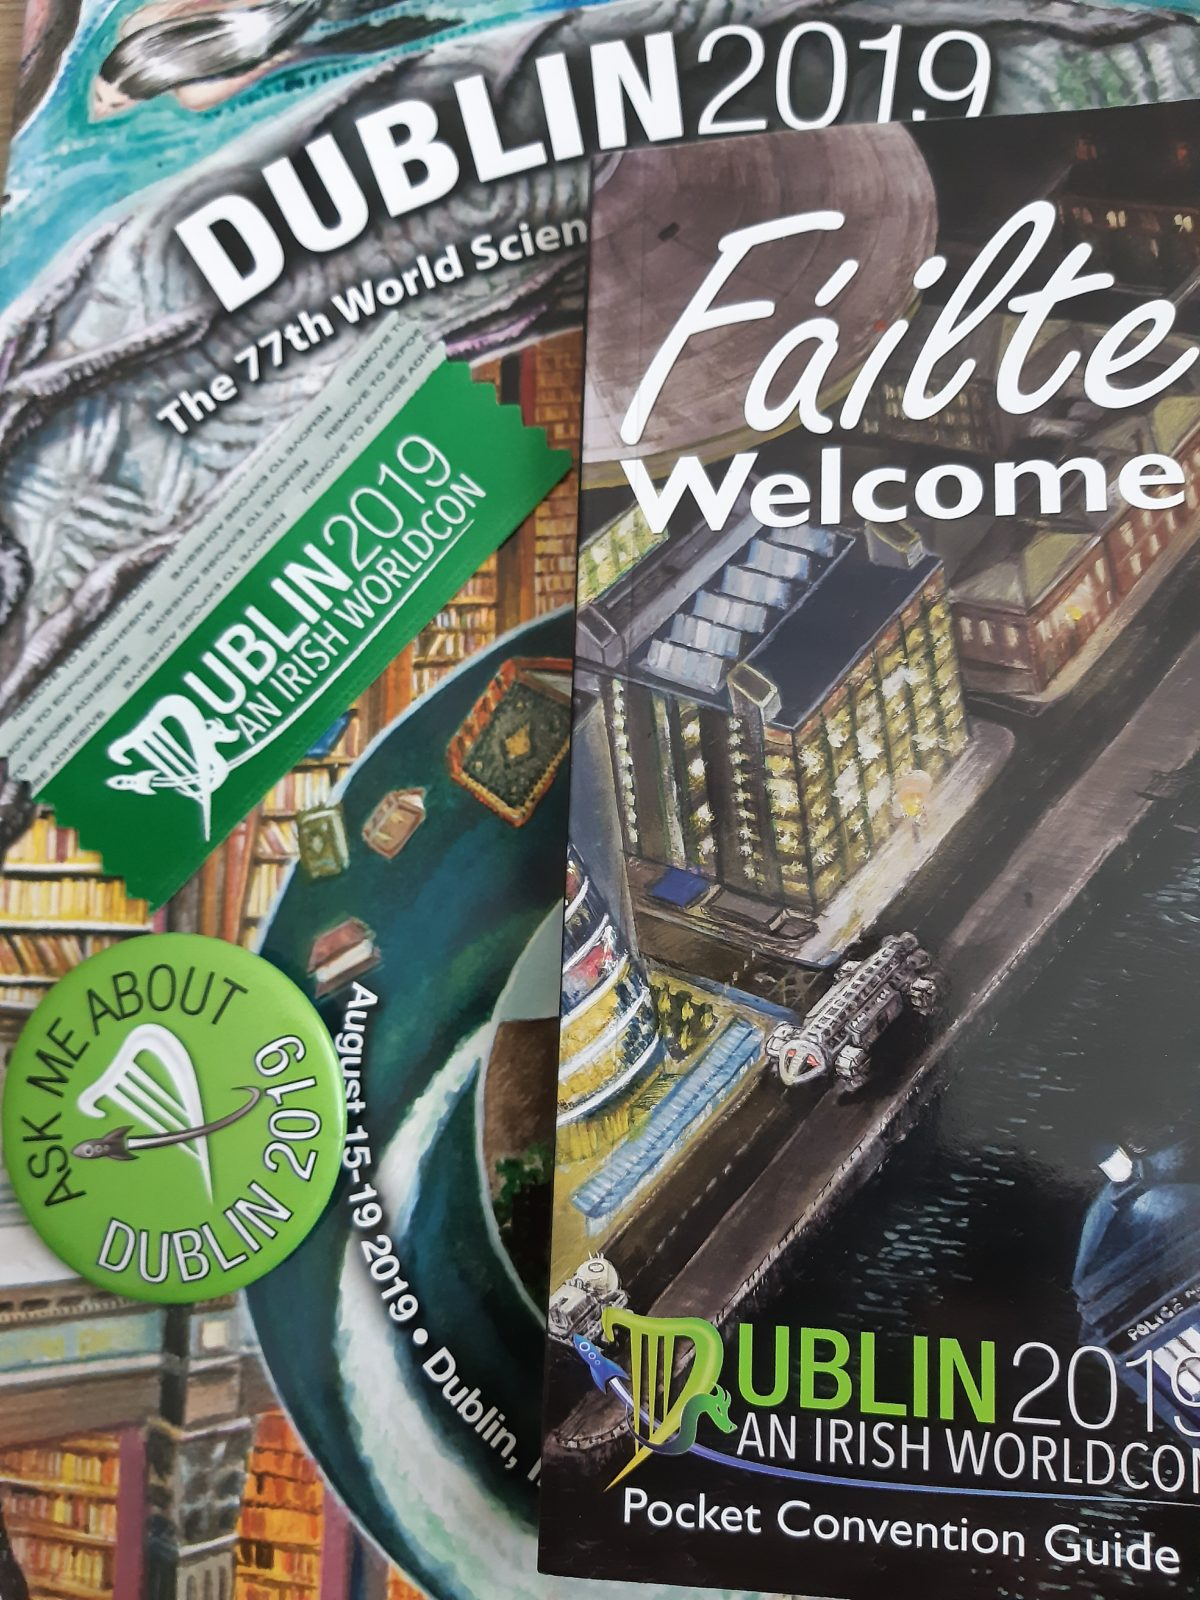 Worldcon Dublin 2019 – HSF (2019/3)